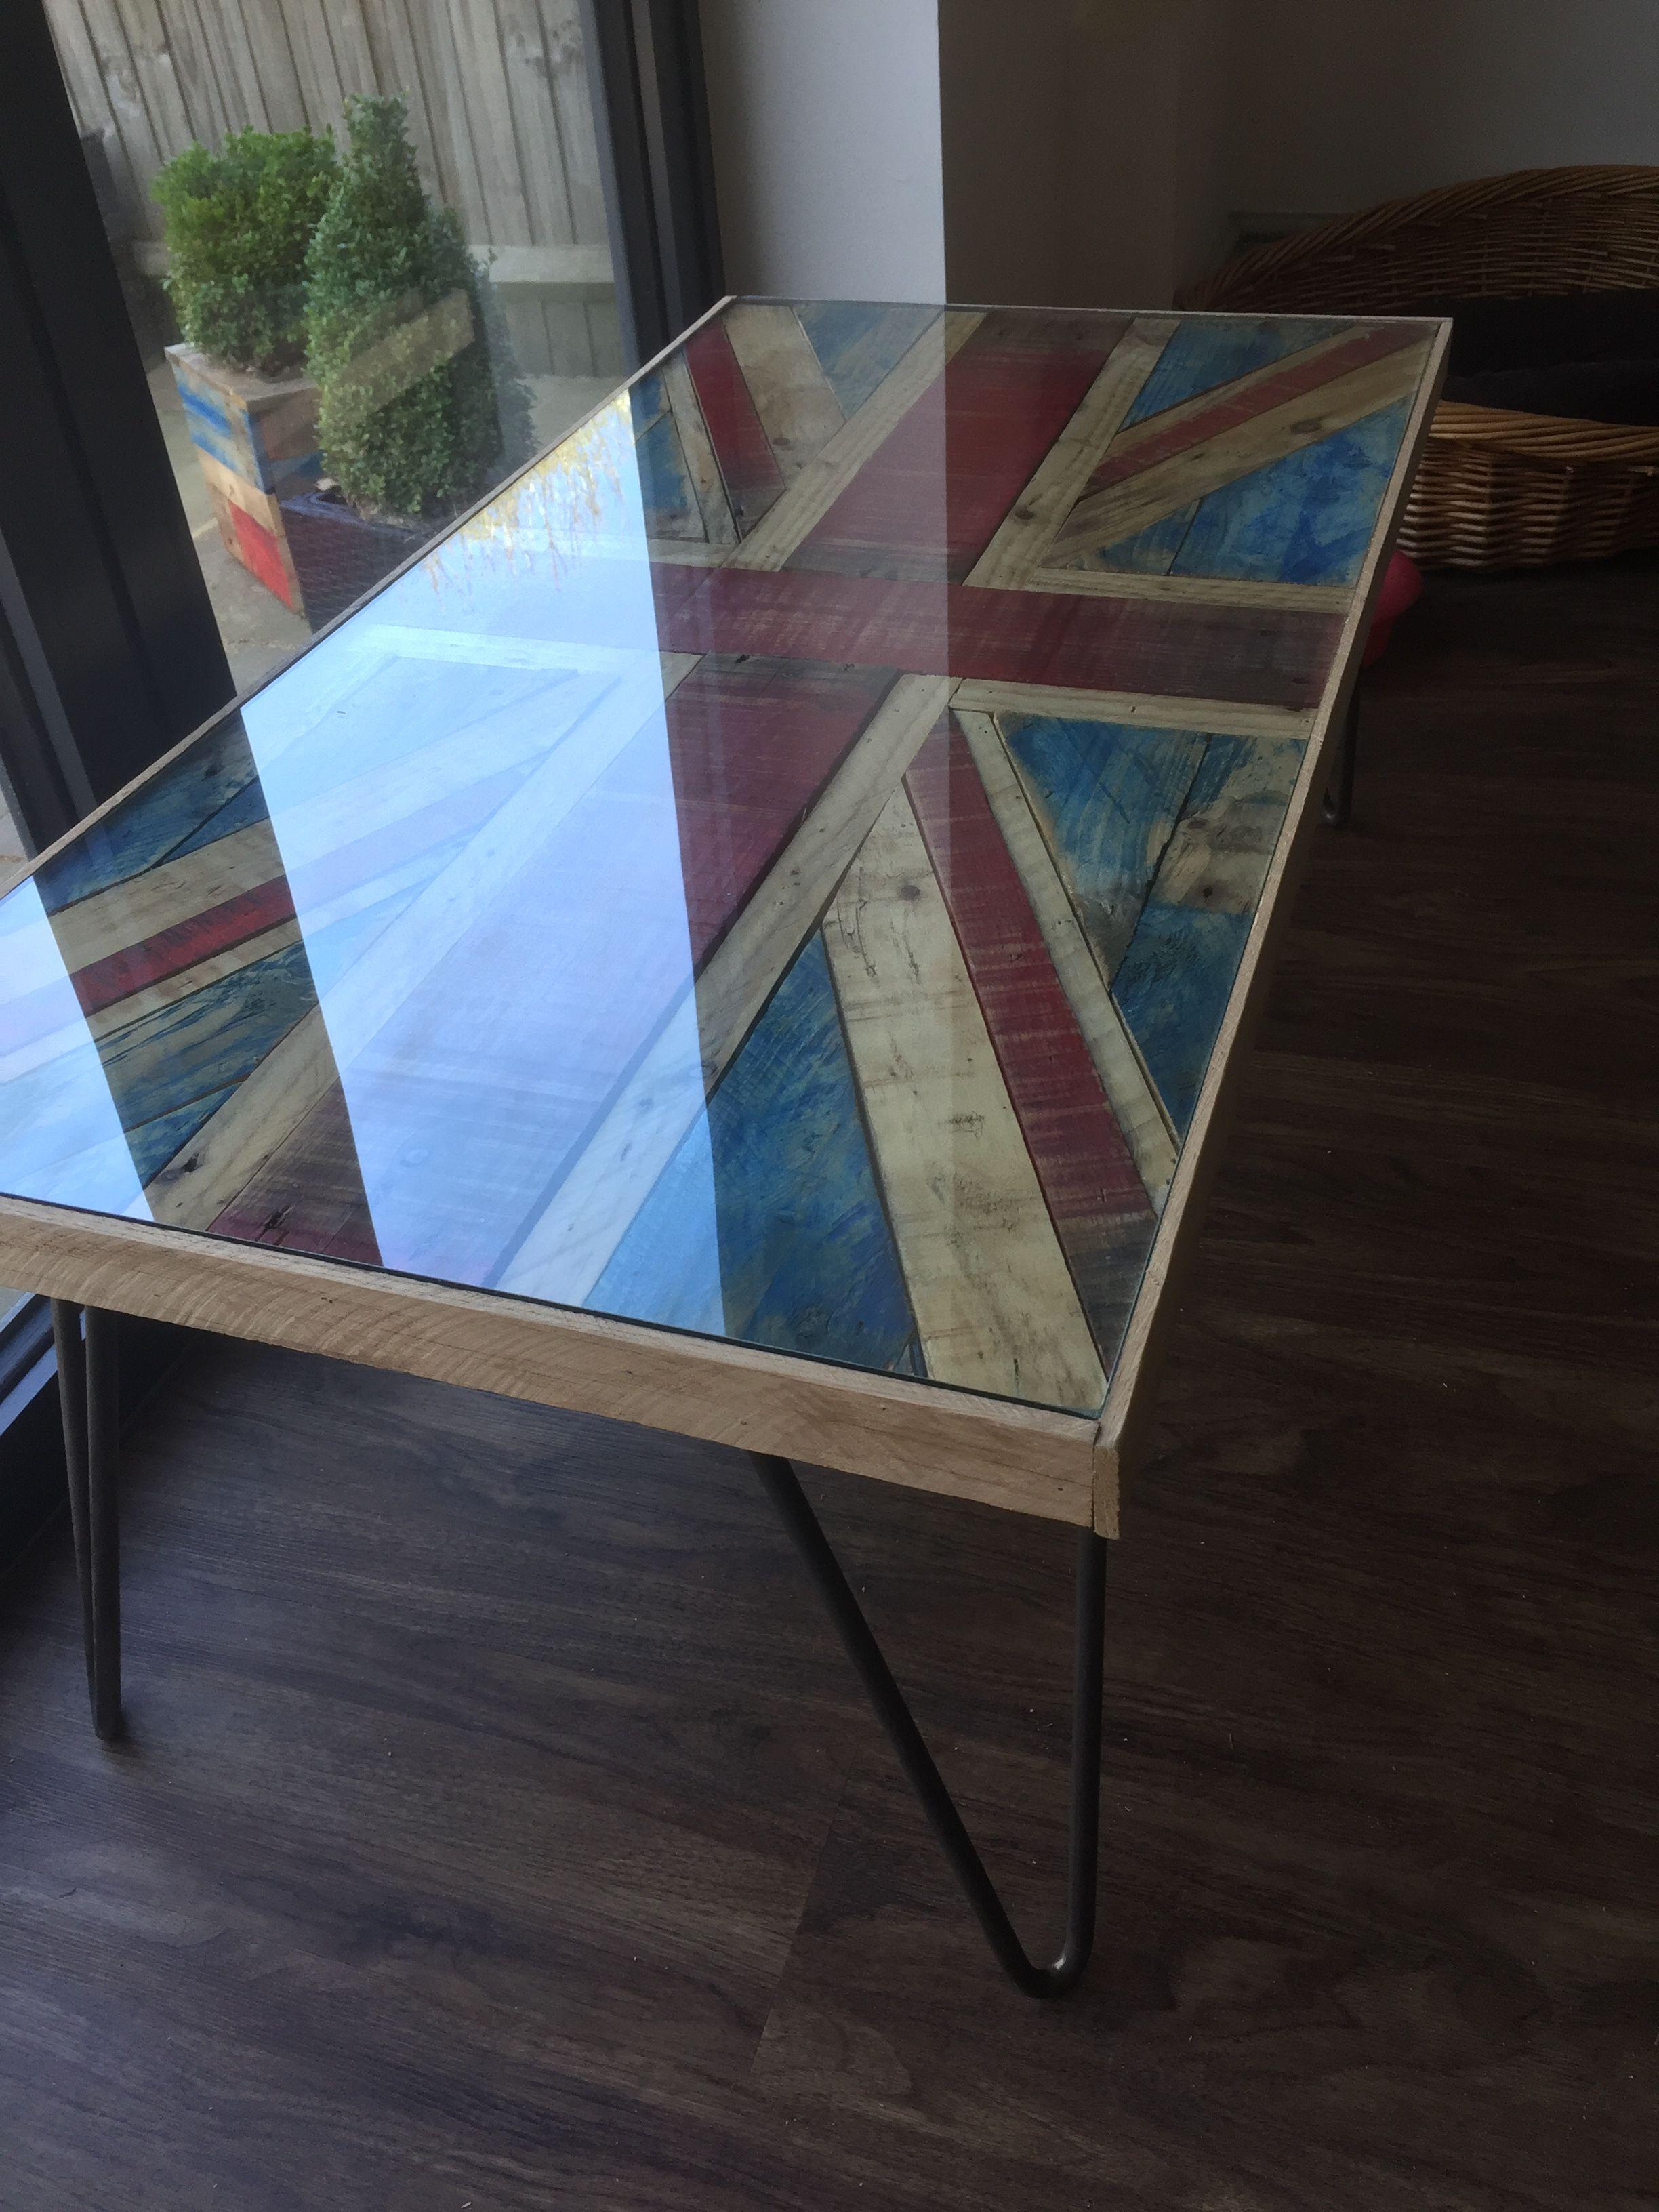 2ae5972267f204485d278e8eed6e35e7 Incroyable De Table Basse Plexi Des Idées